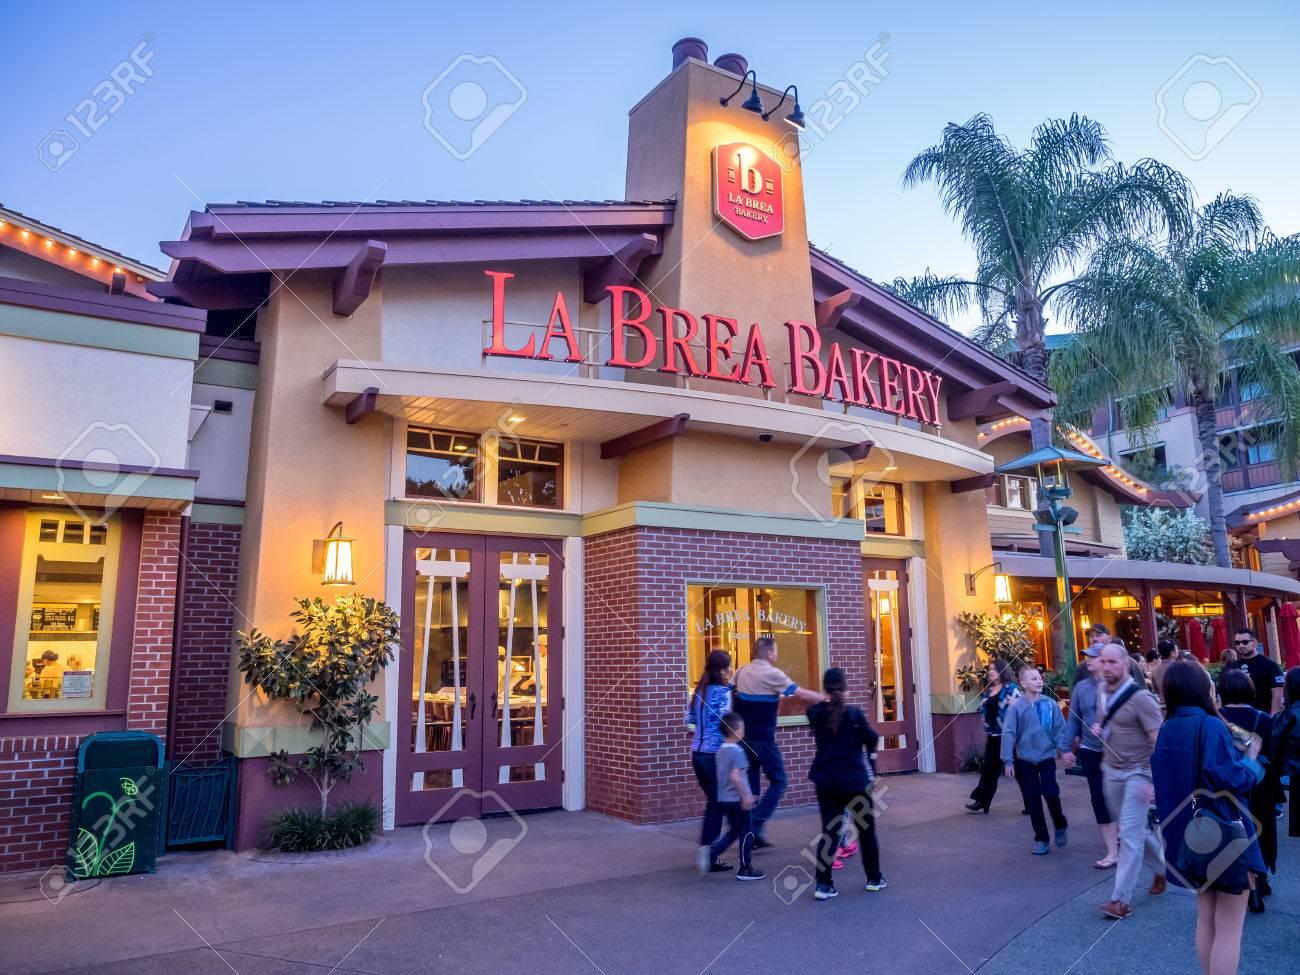 anaheim california february 11 la brea bakery store in downtown disney on february